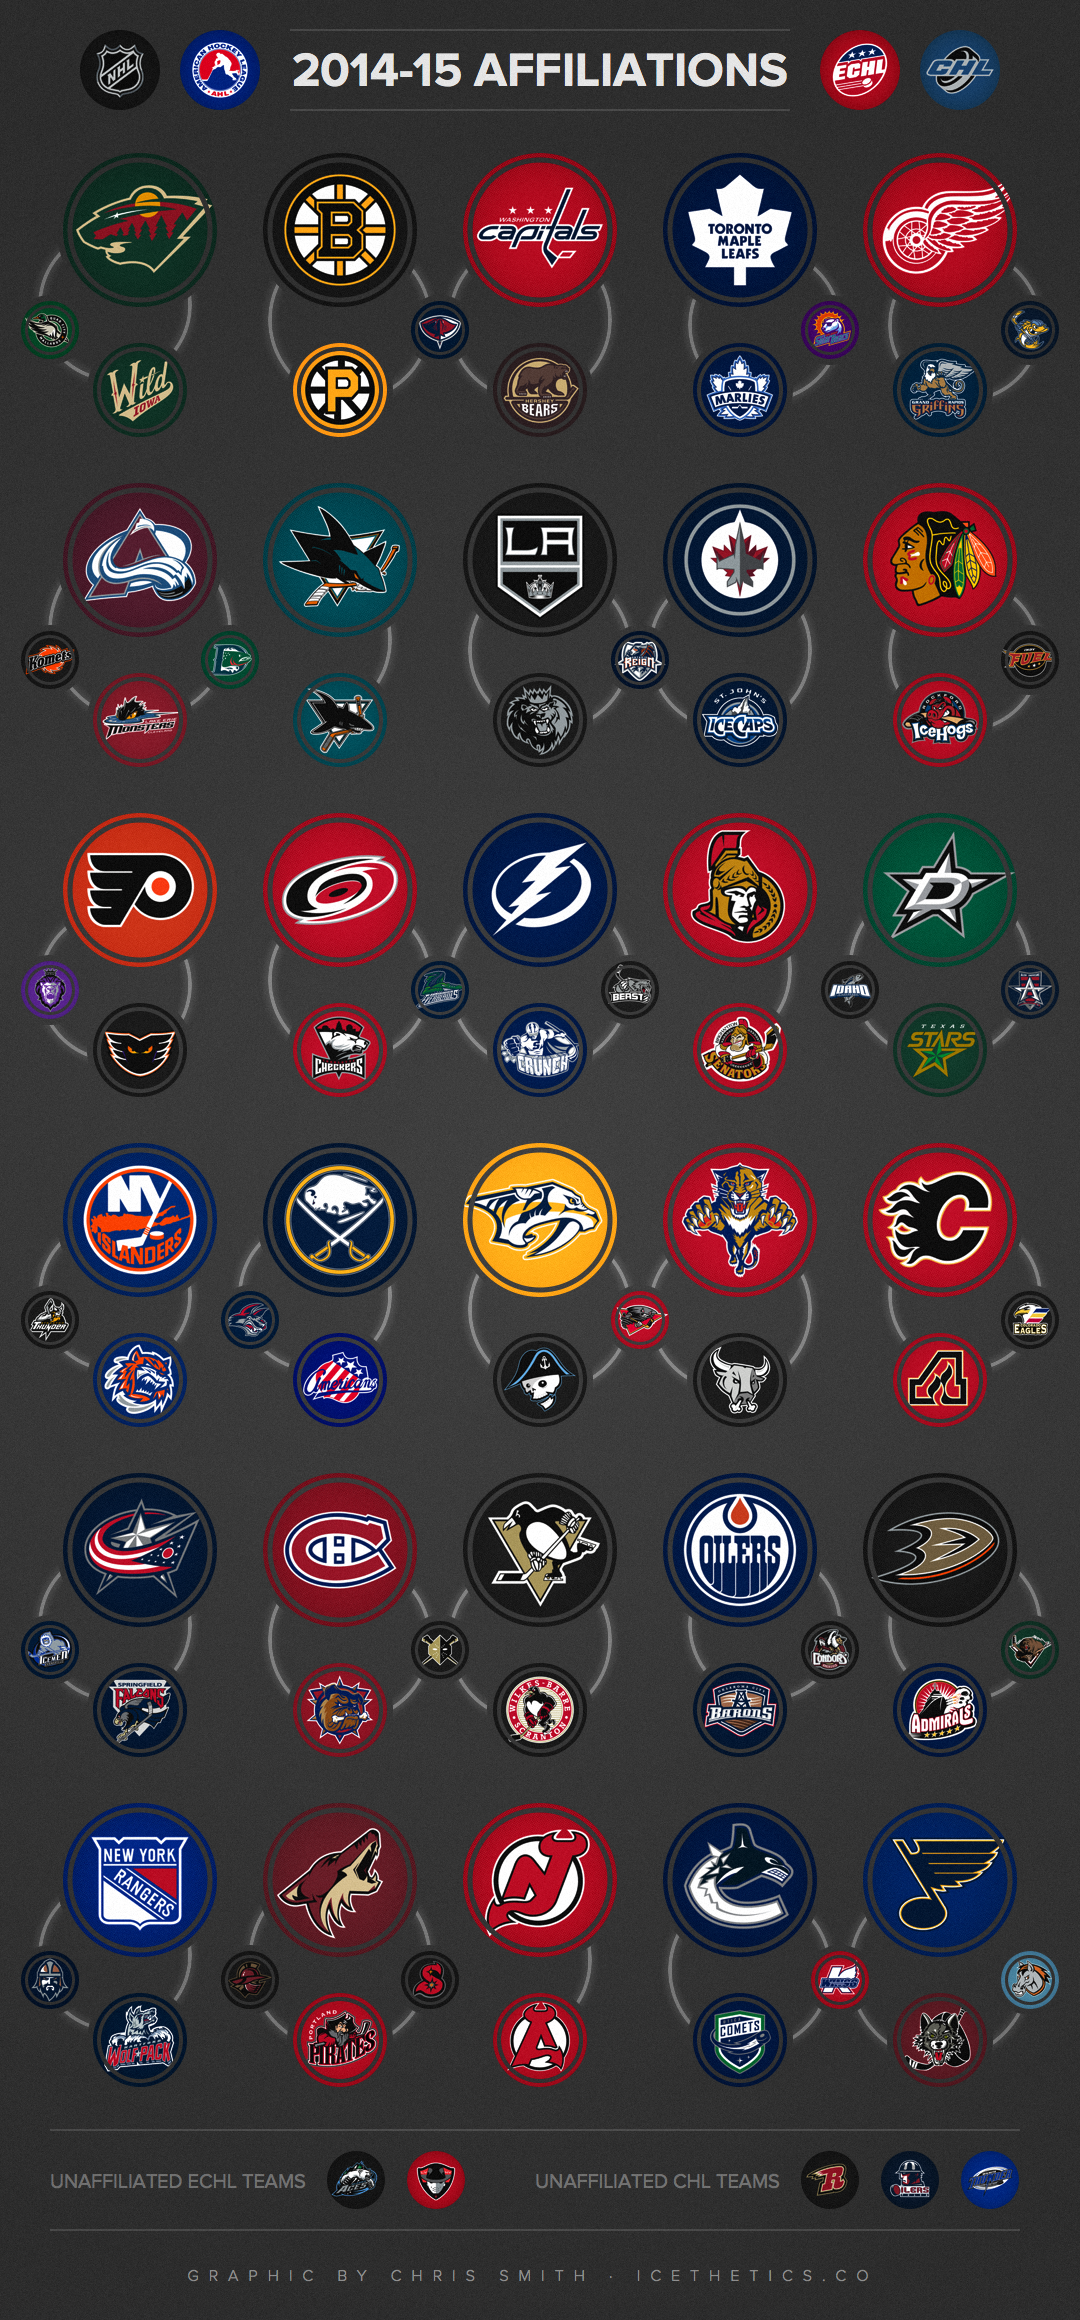 Flyers affiliates